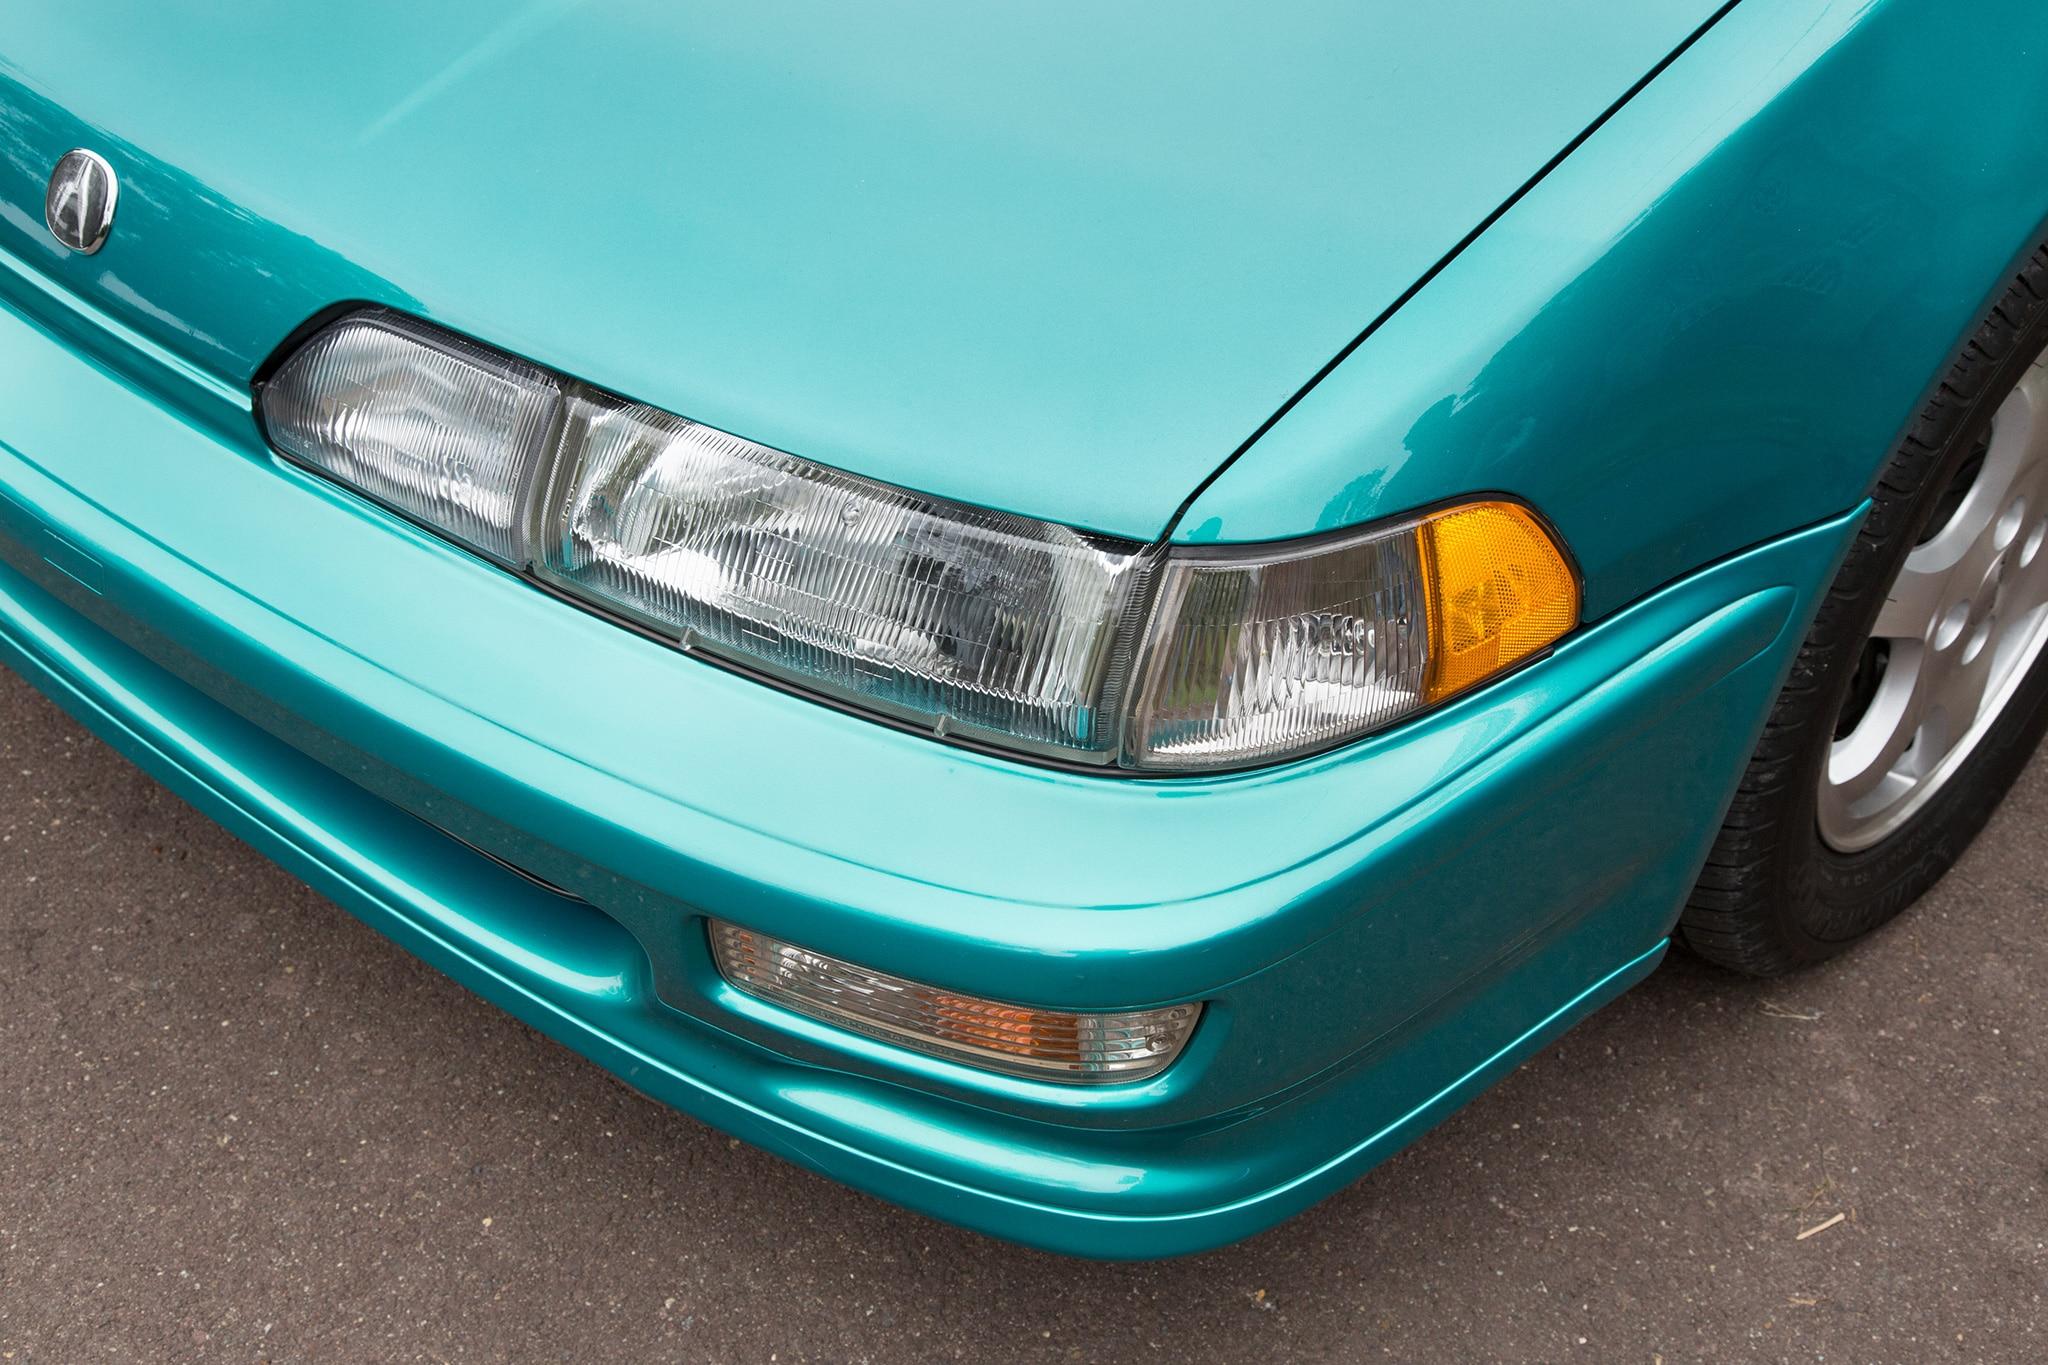 Acura Integra Headlight Johnleimberg Acura Integra - 1991 acura integra headlights